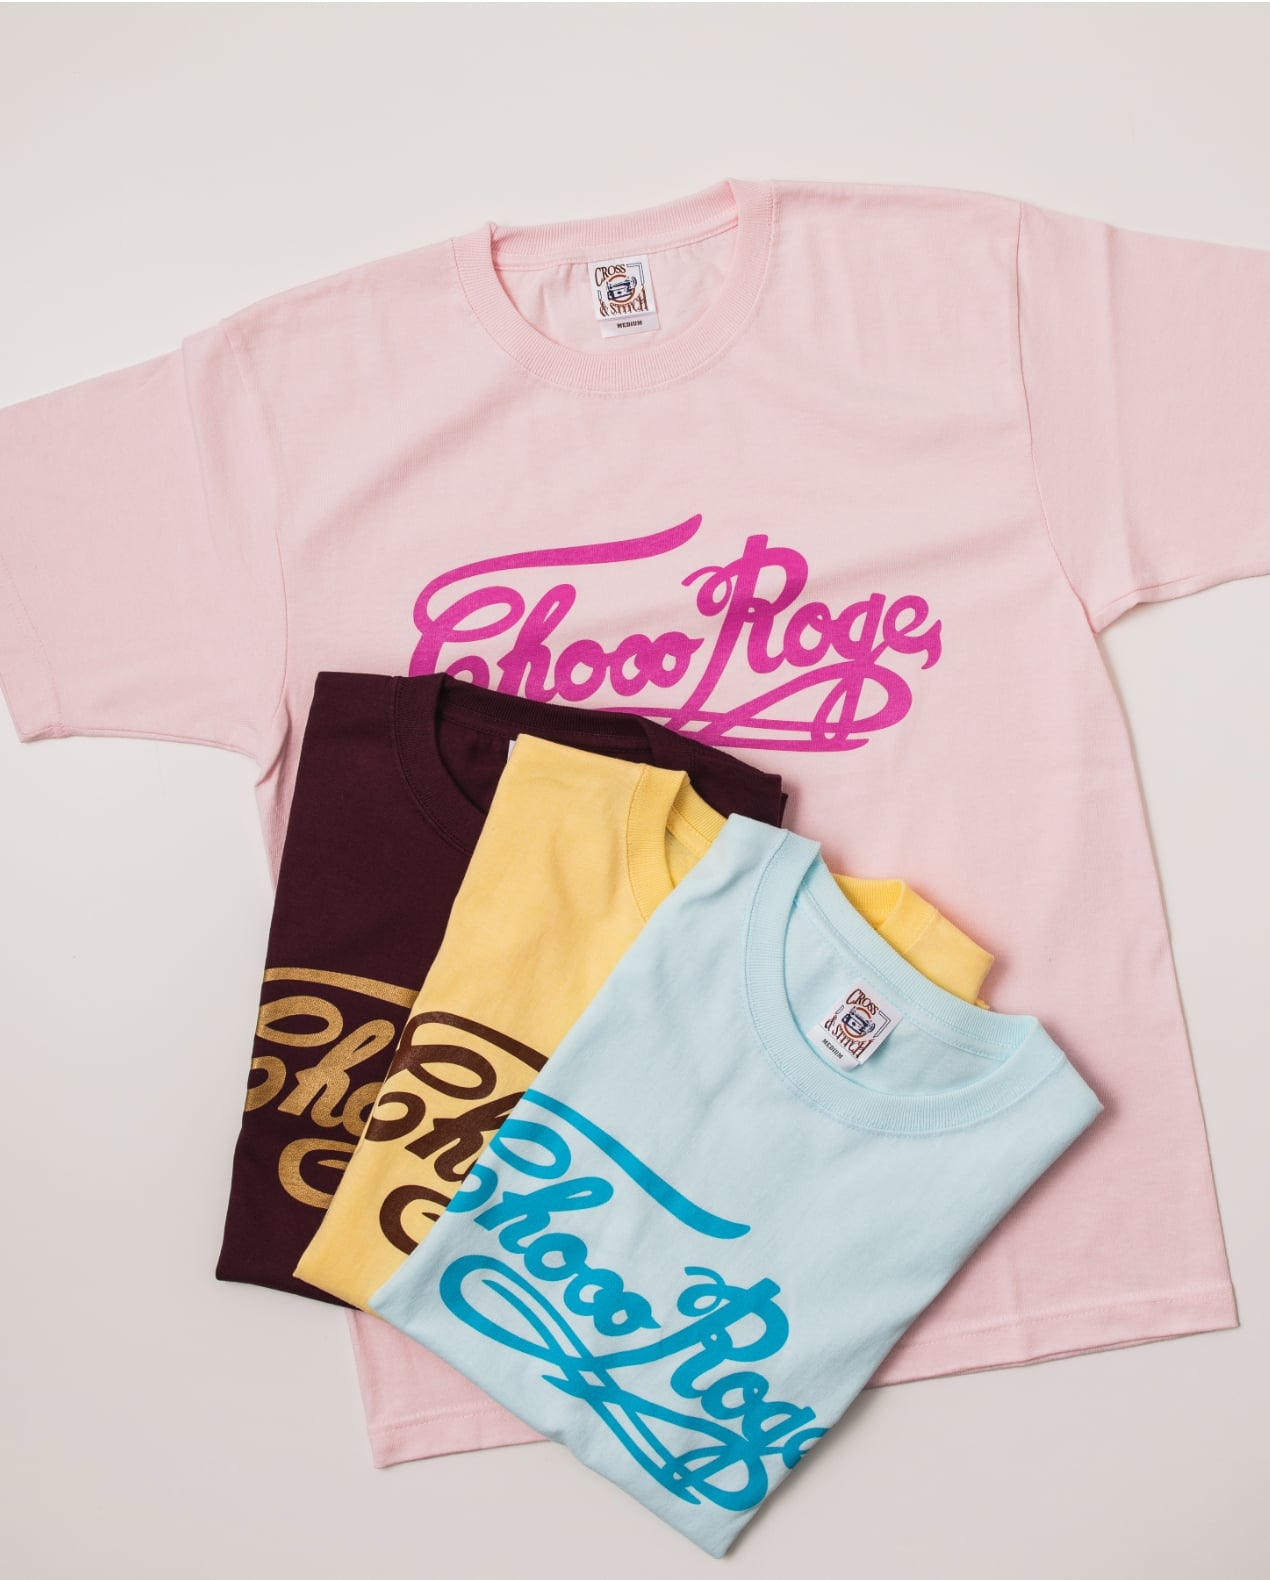 Tシャツ 子供用 黄色 サイズ120